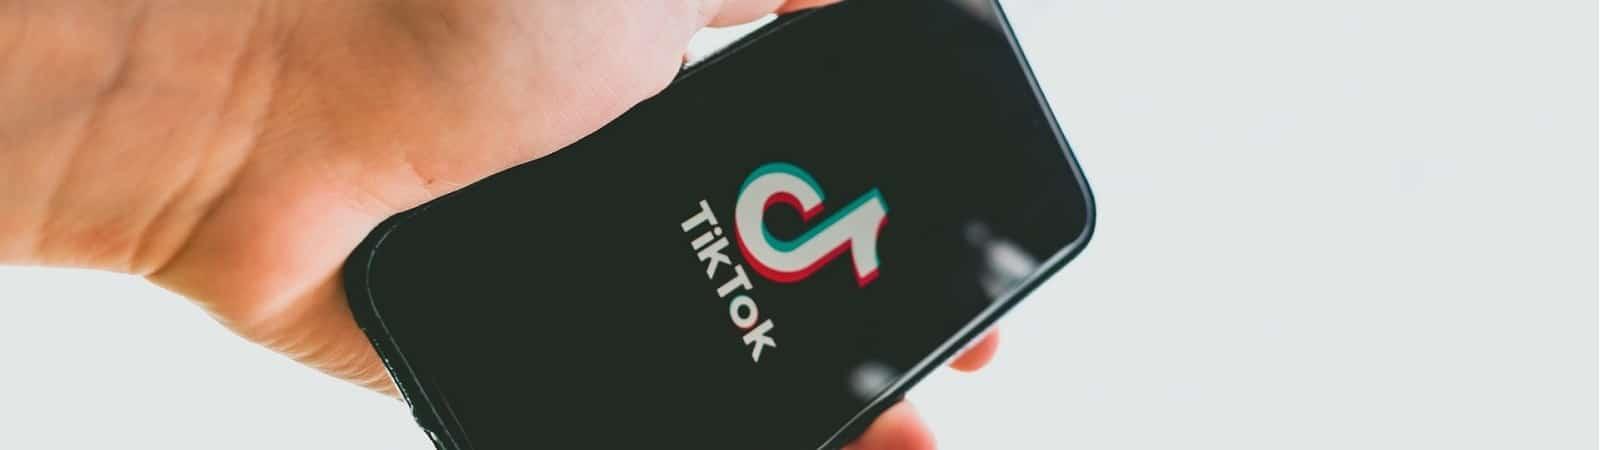 Microsoft Plans to Acquire TikTok